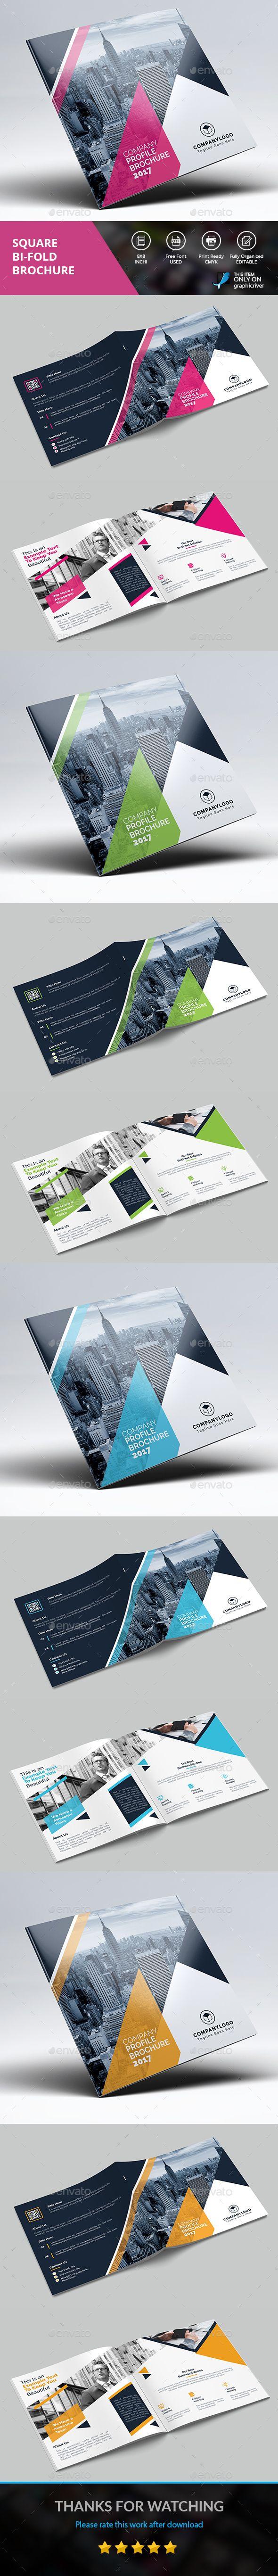 Square Brochure Template PSD